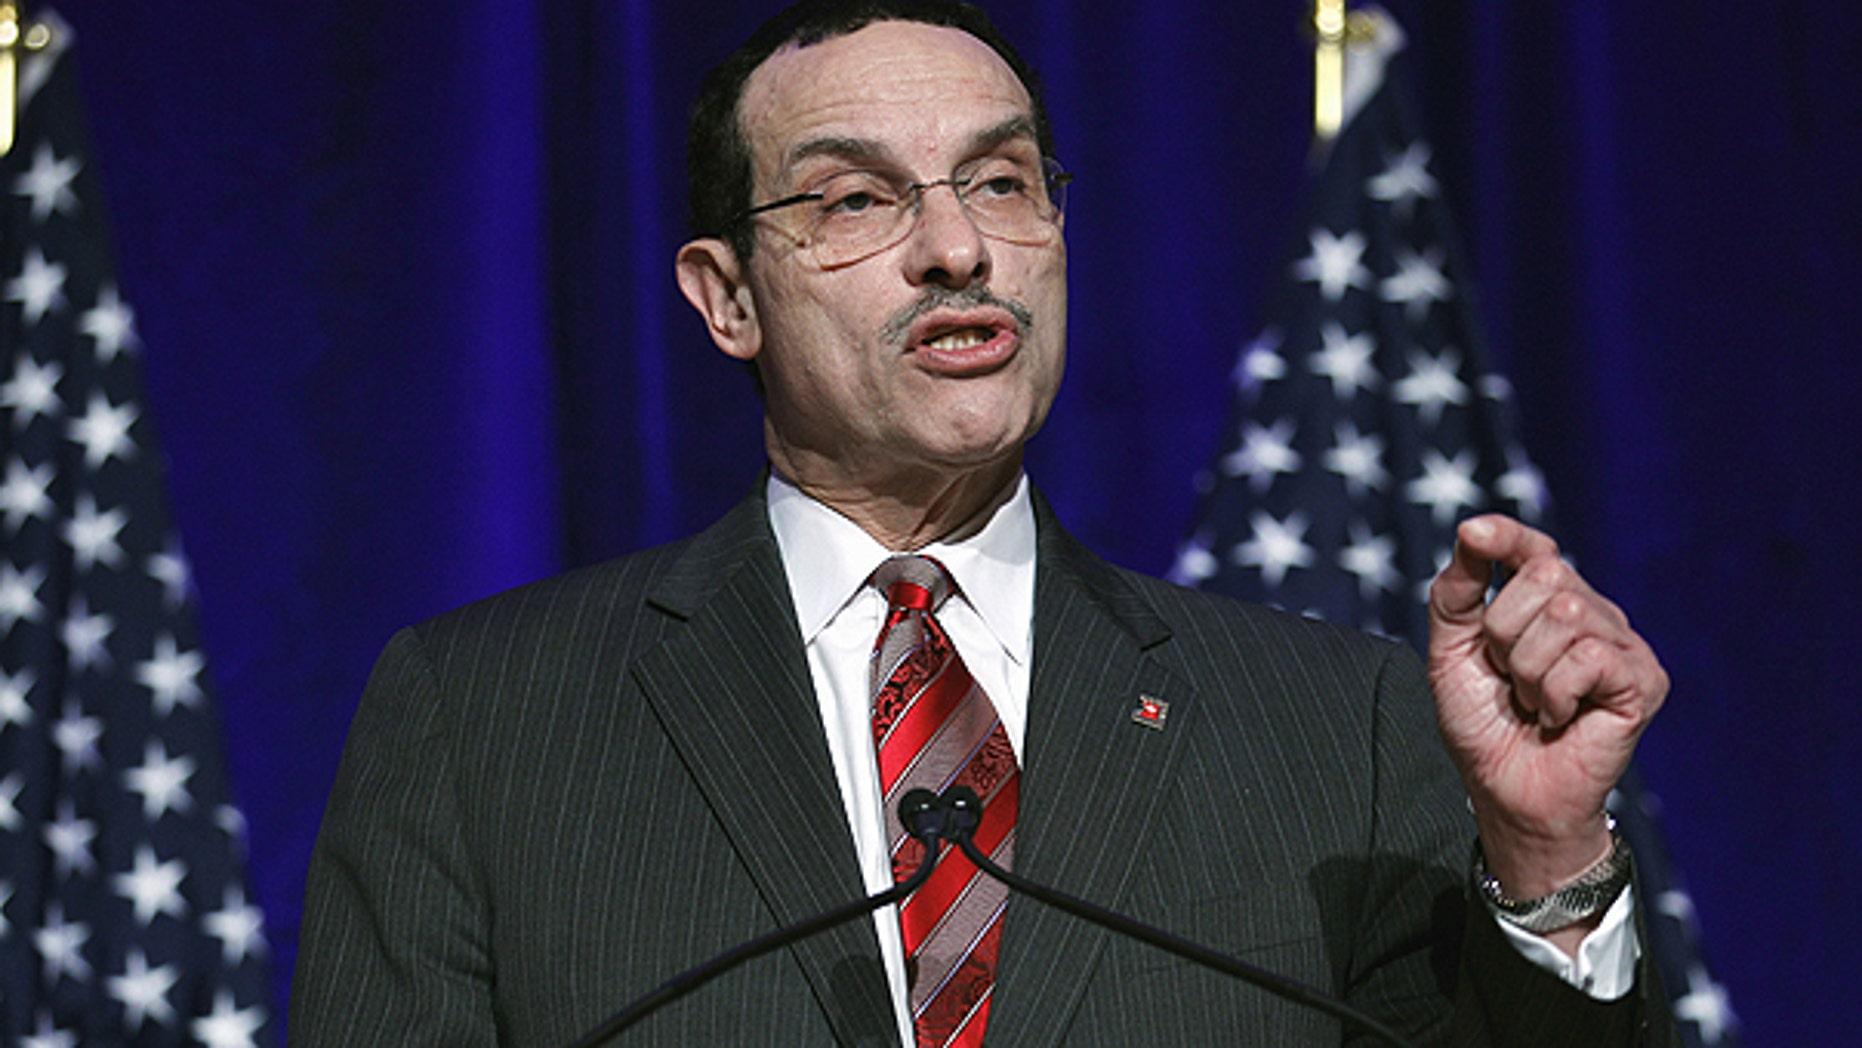 Feb. 26: Washington Mayor Vincent Gray addresses the Democratic National Committee winter meeting in Washington.